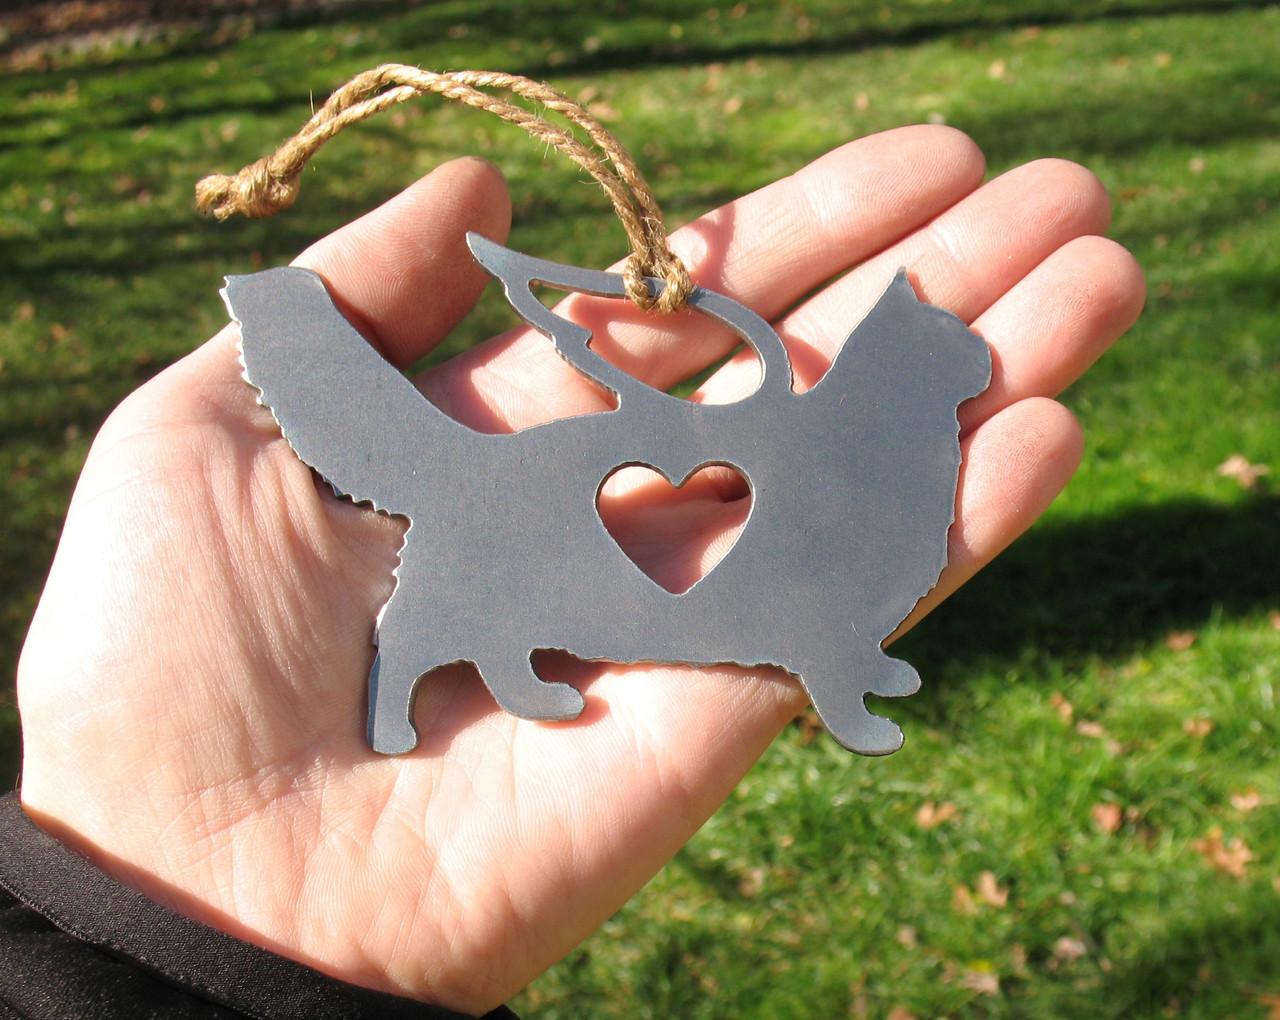 Maine Coon Cat Memorial Angel - Cat Loss Gift - Pet Loss Cat Sympathy Remembrance Gift - Metal Cat Christmas Ornament - Cat Lover